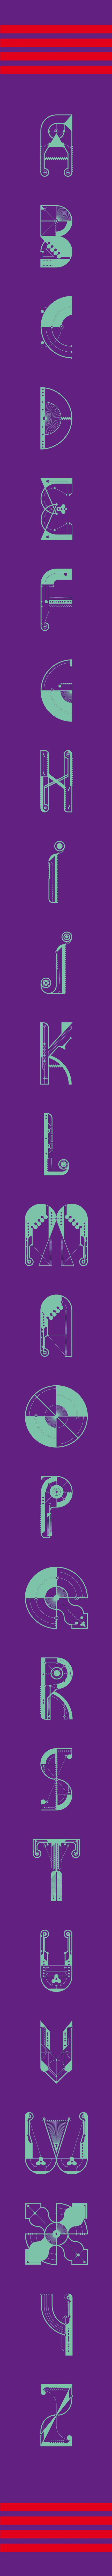 Tipografia Di Jorrit Van Rijt Piazza Pollici Design Blog Typography Lettering Alphabet Typography Alphabet